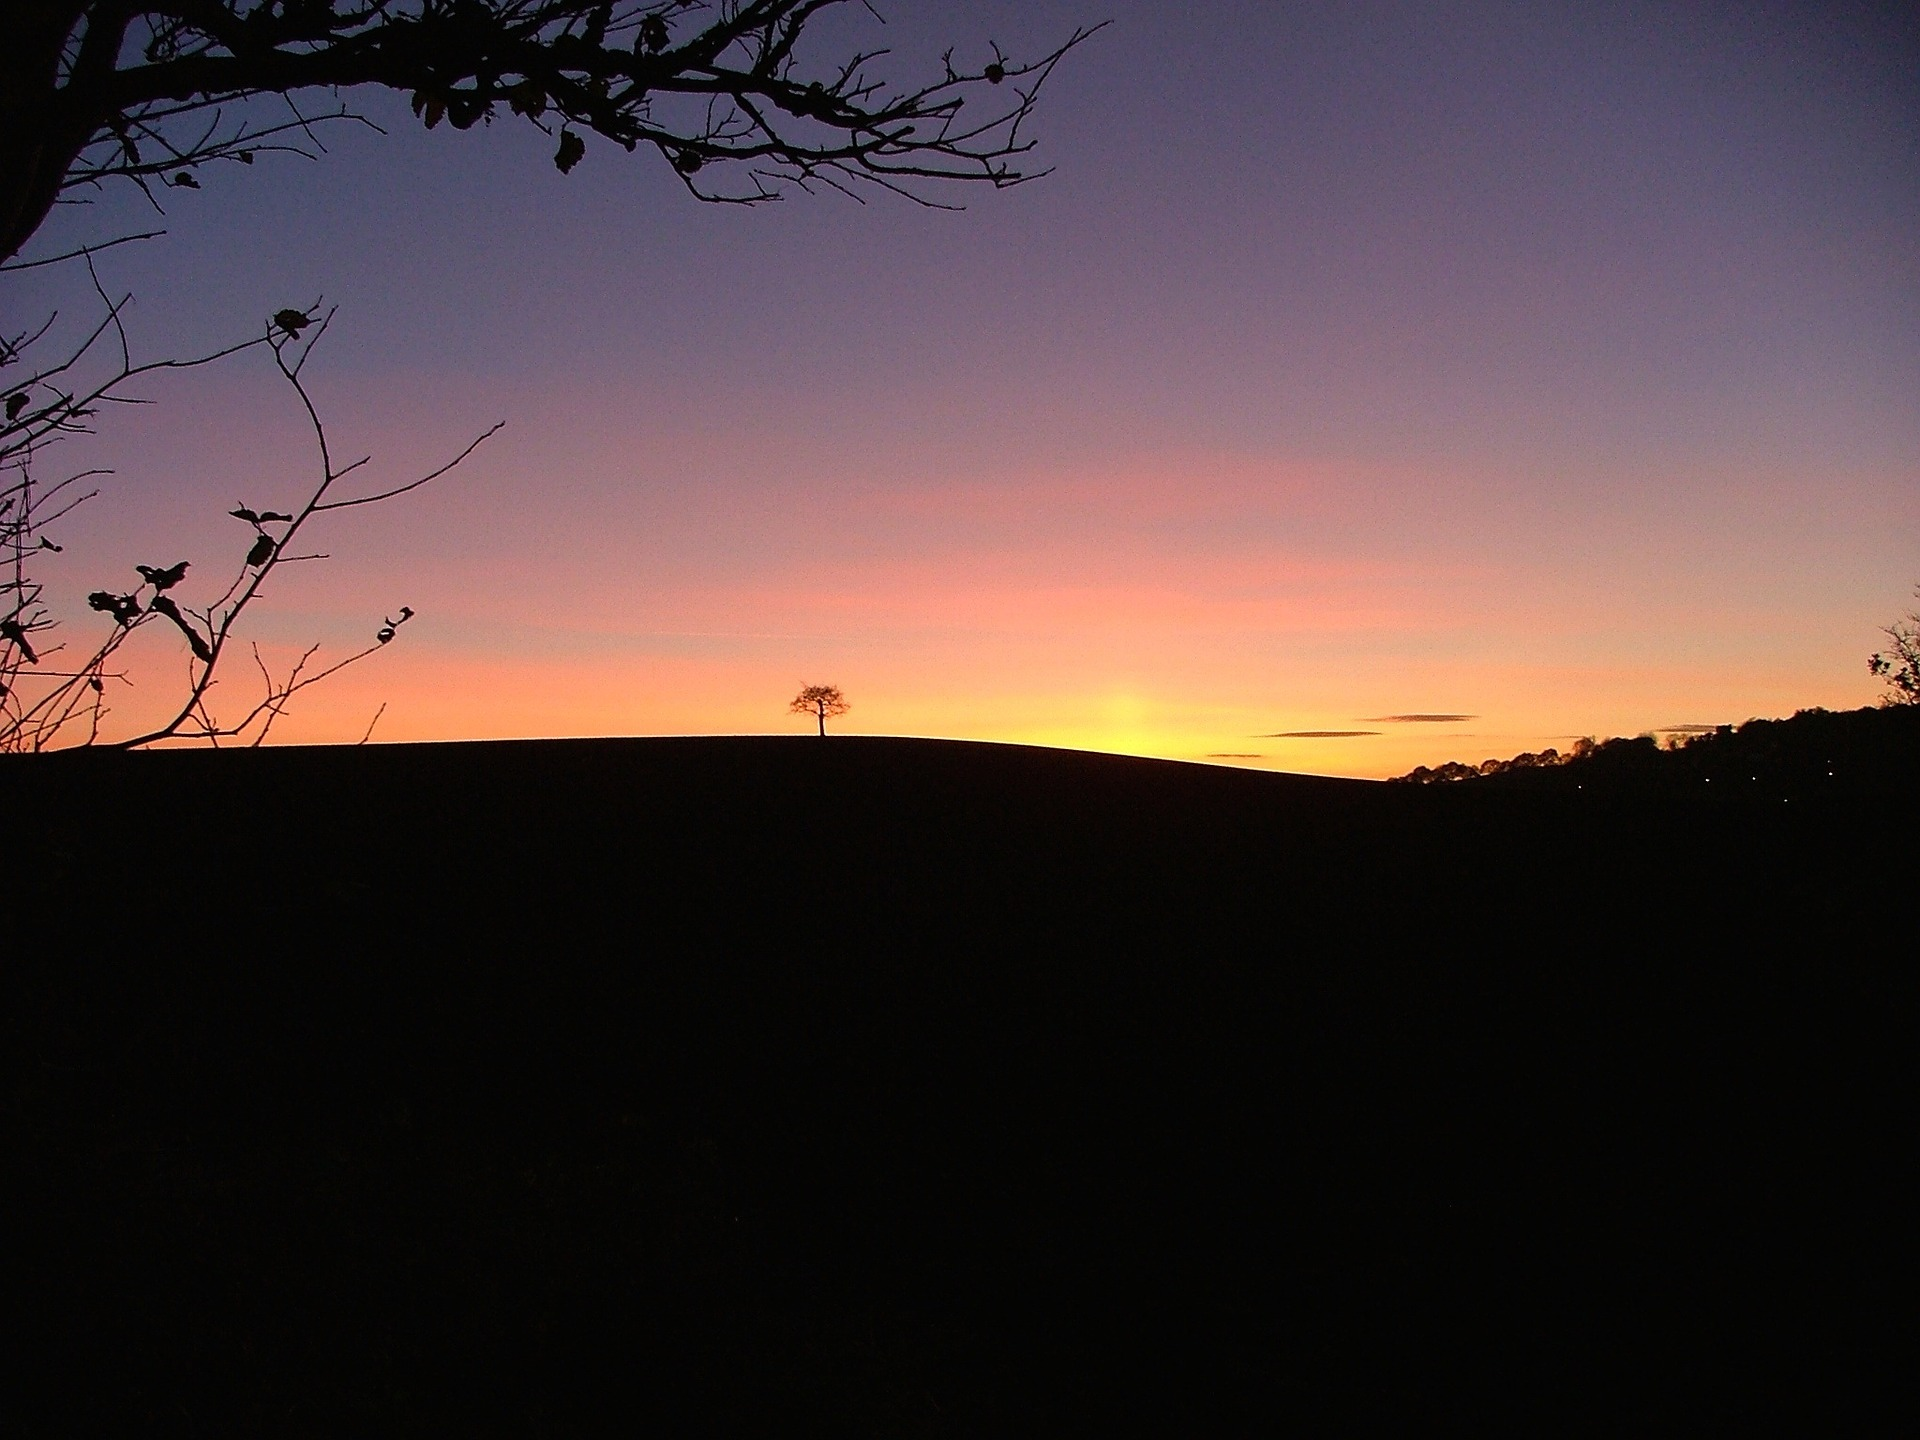 sunset-650538_1920